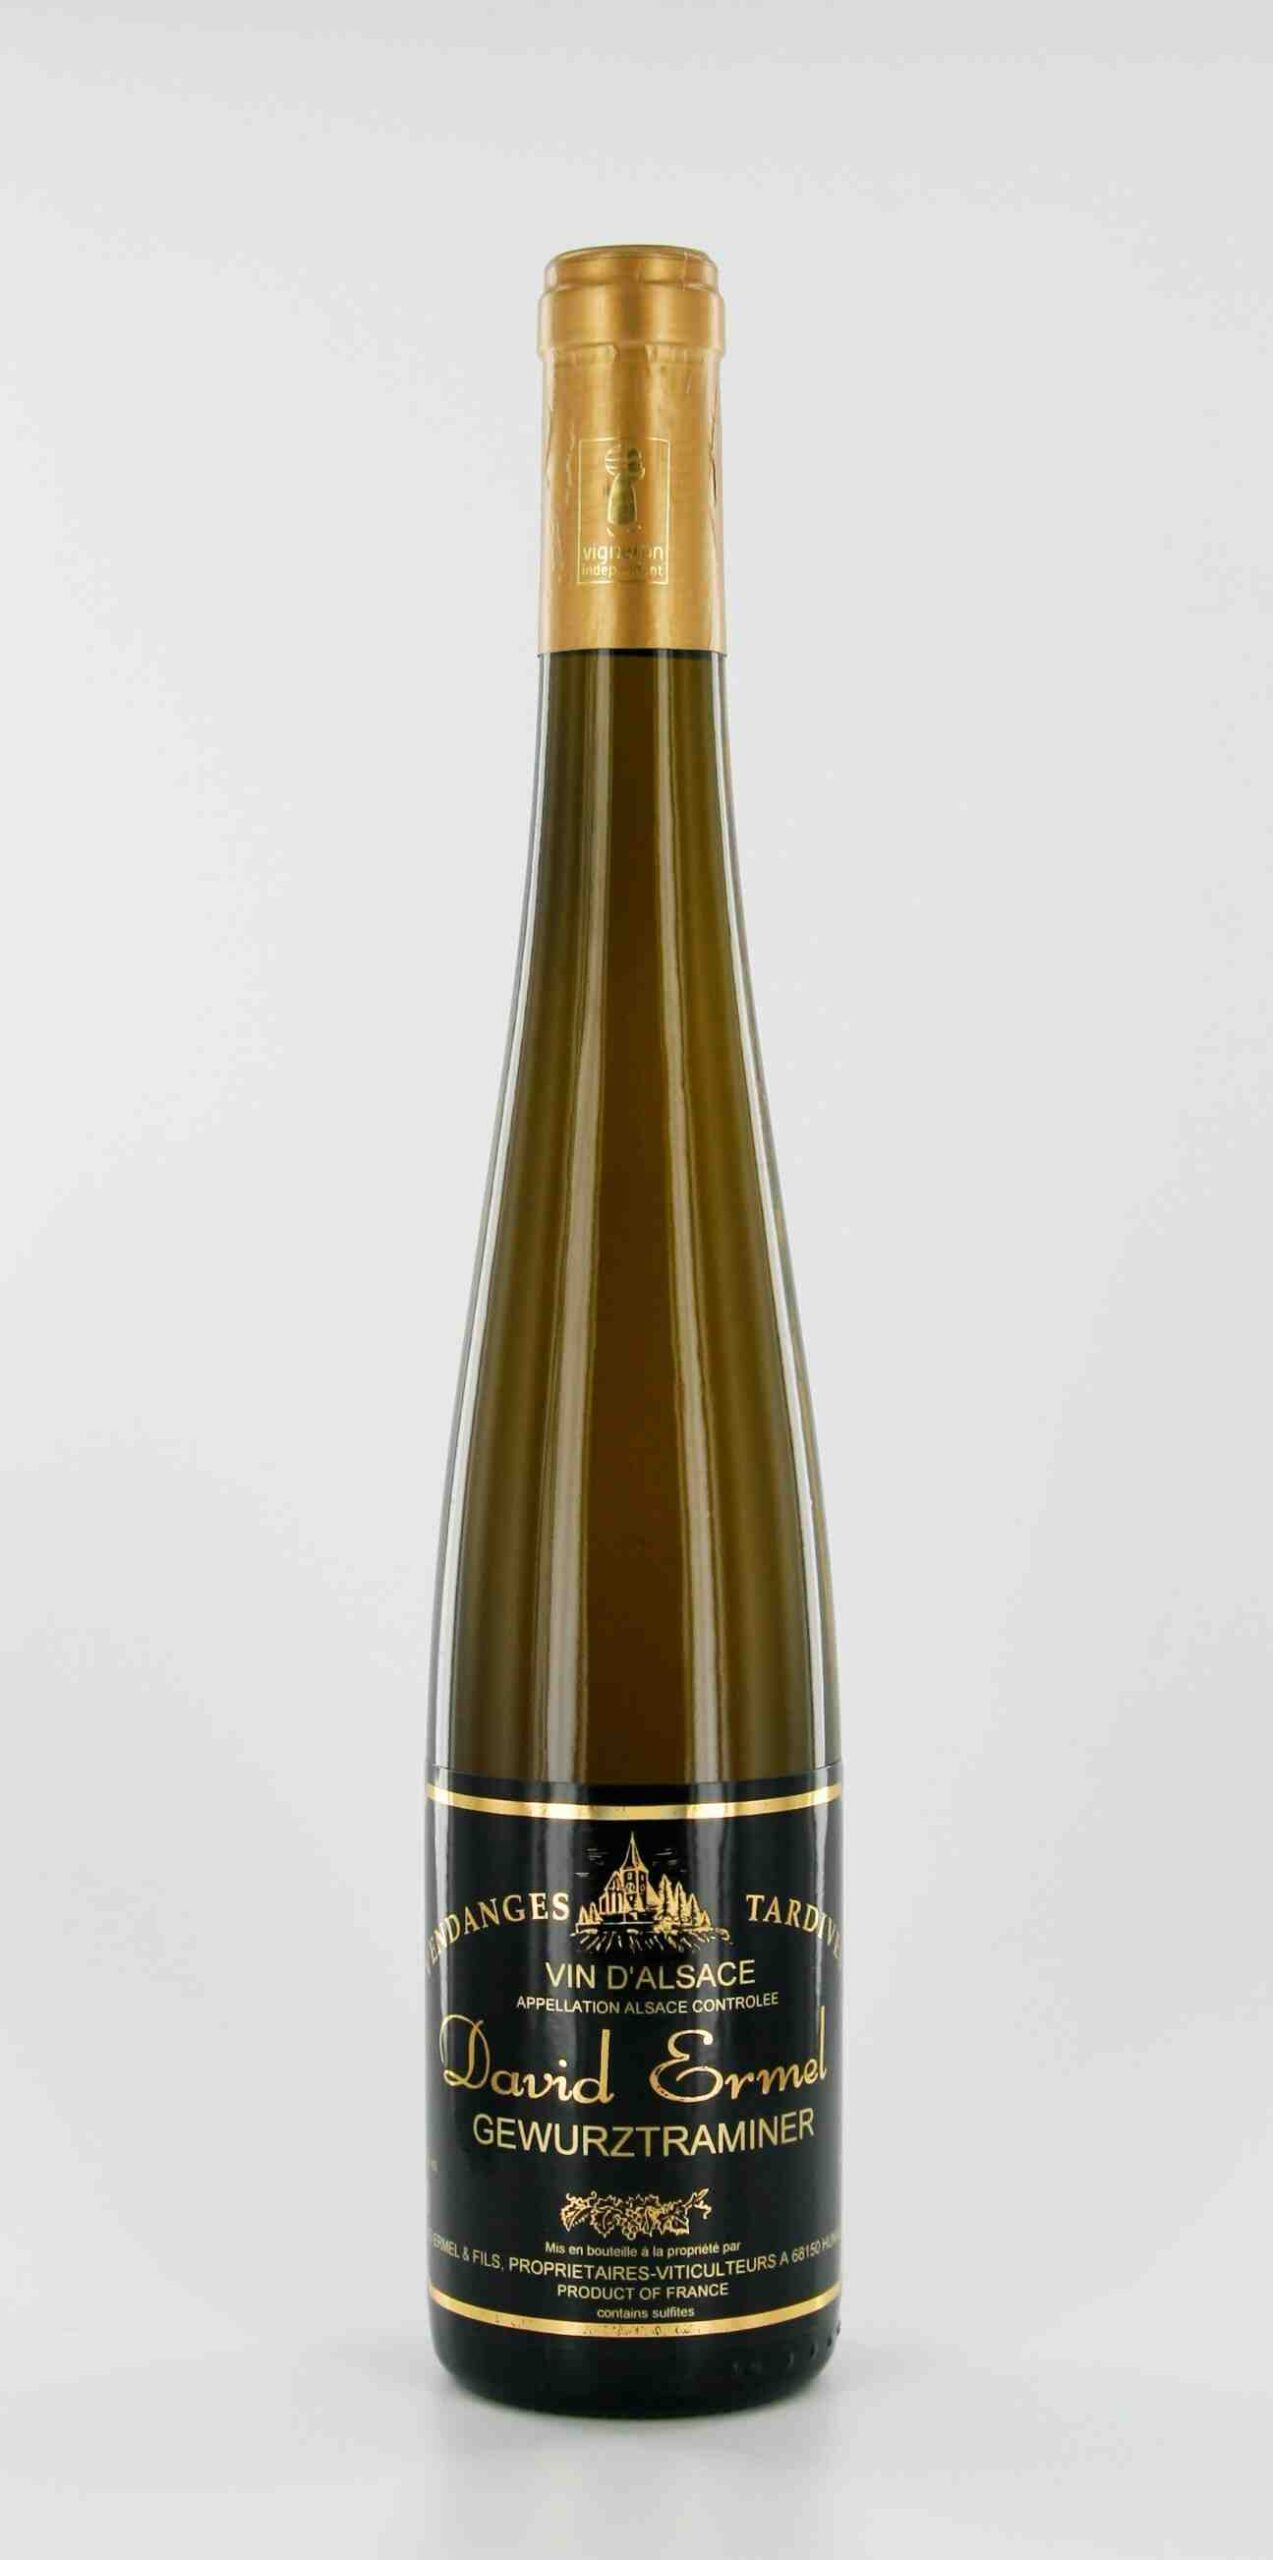 Quel type de vin est le gewurztraminer?